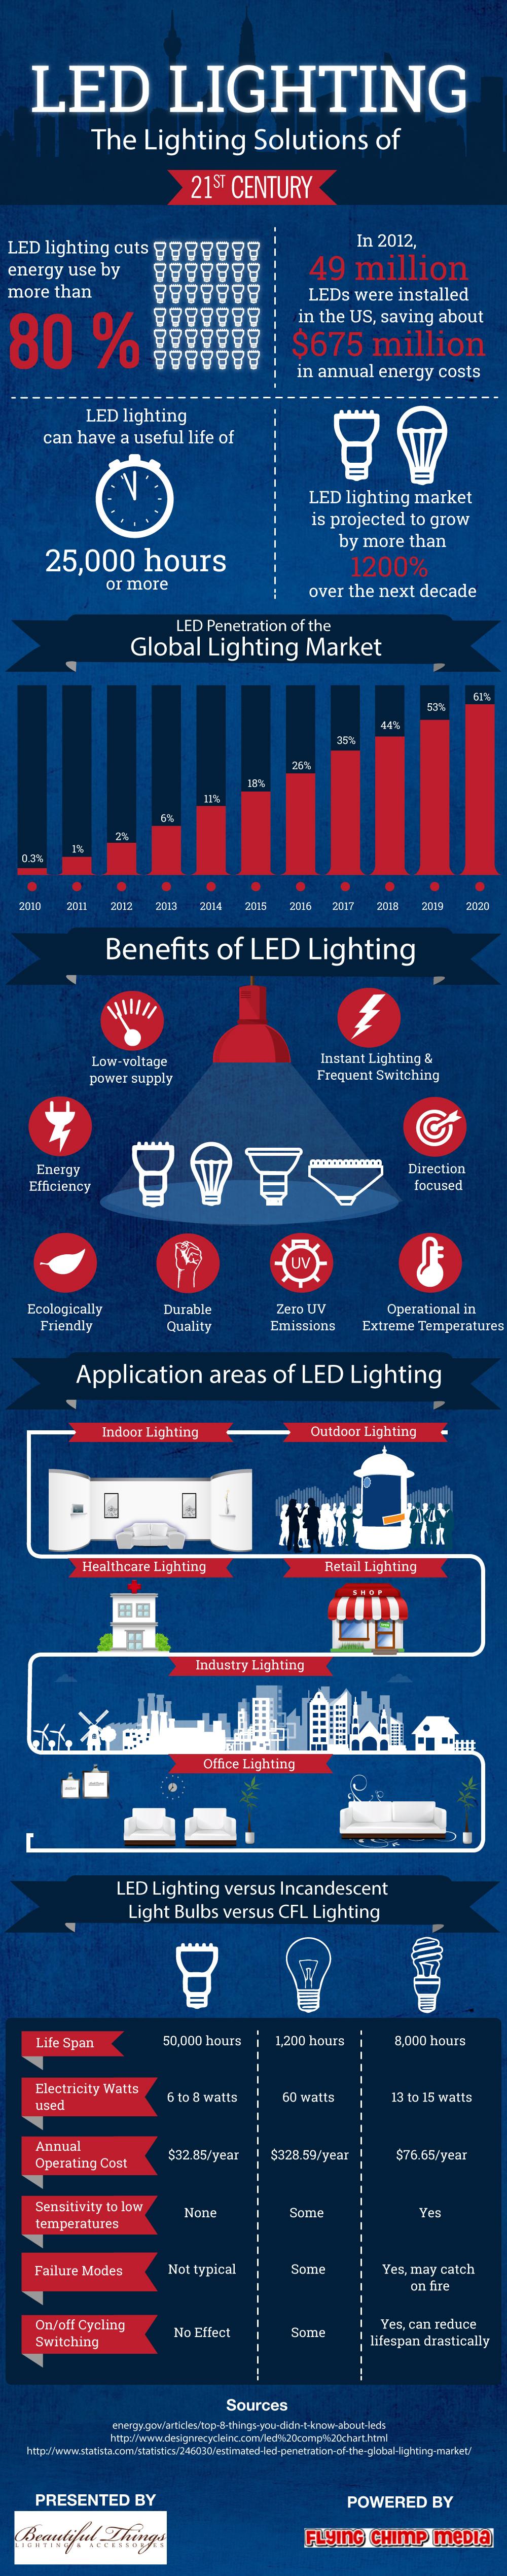 LED Lighting: Ideal Lighting Solution of Modern Times